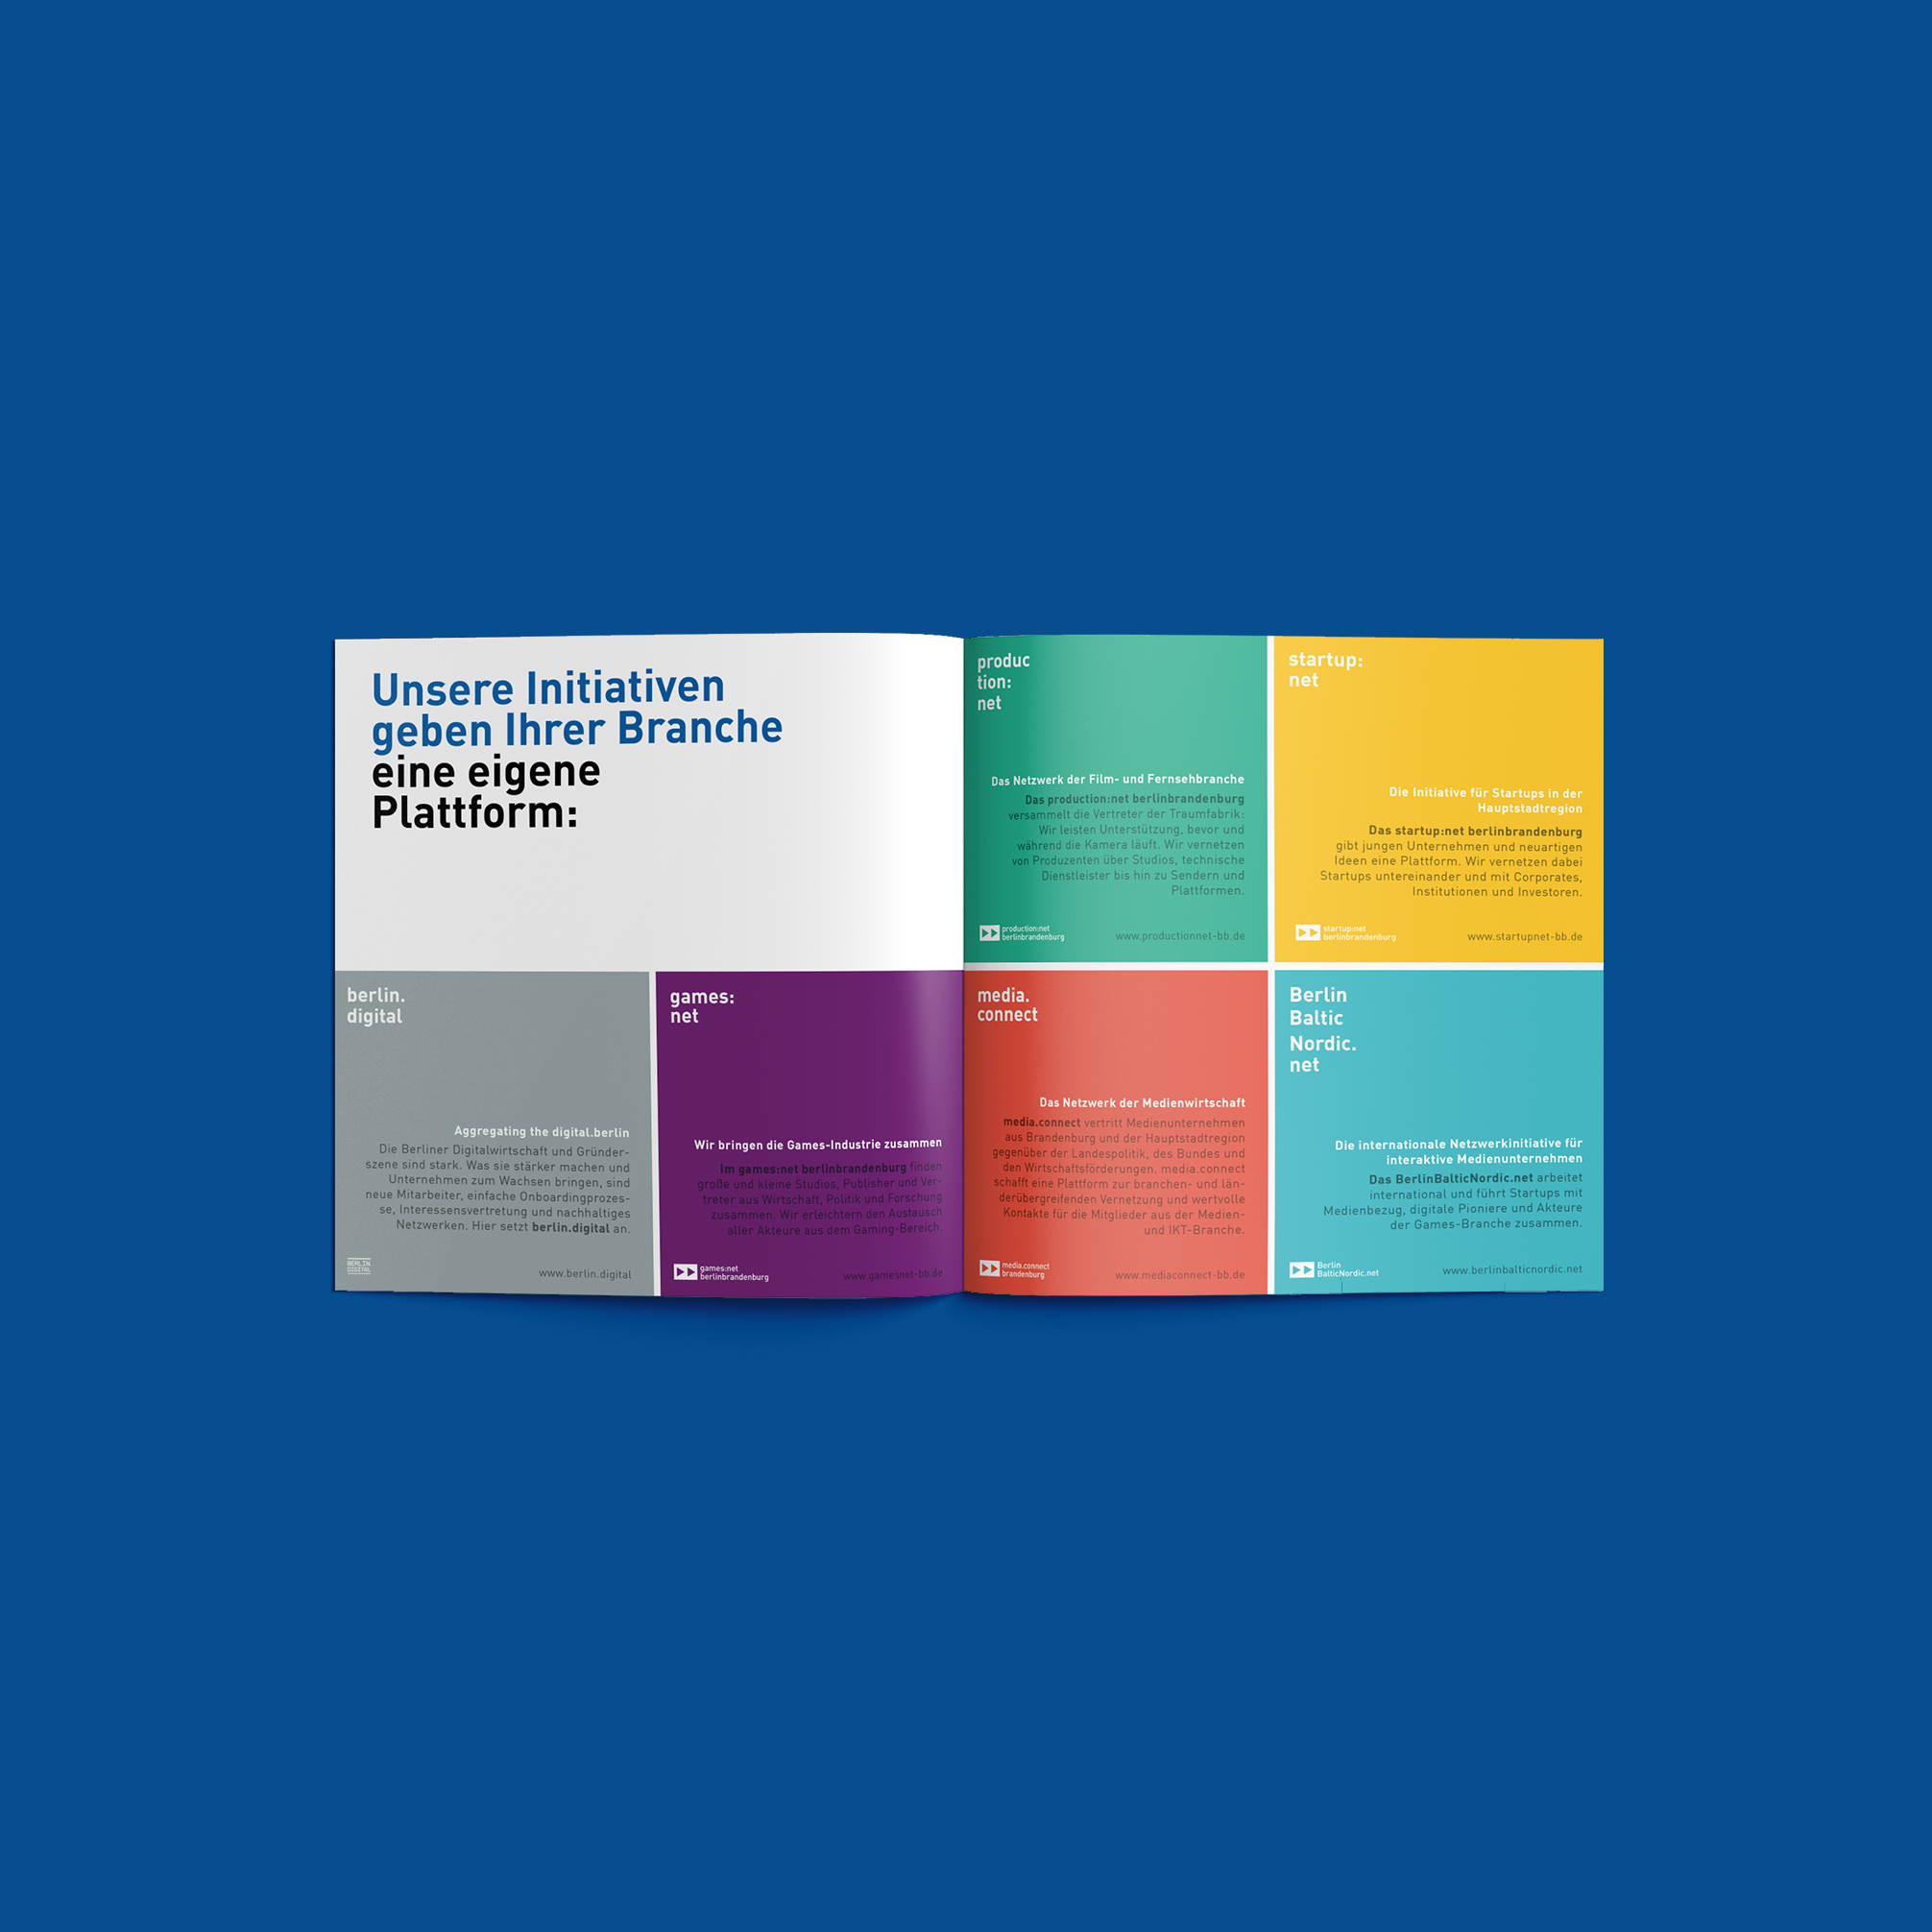 Redesign Media net berlinbrandenburg Image Broschüre - Branche | Corporate Design